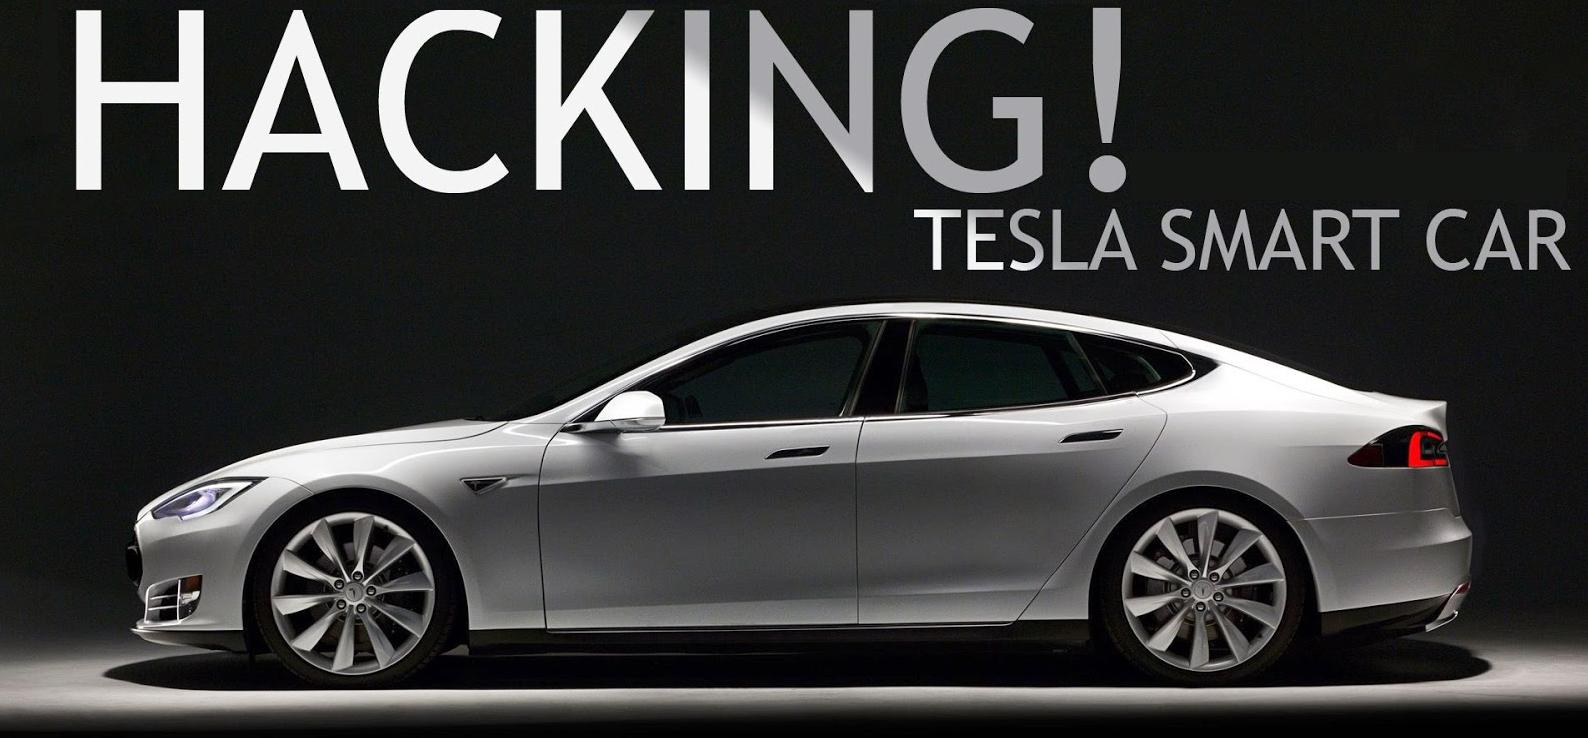 Tesla hackers, Tesla car hacking, Tesla hacked